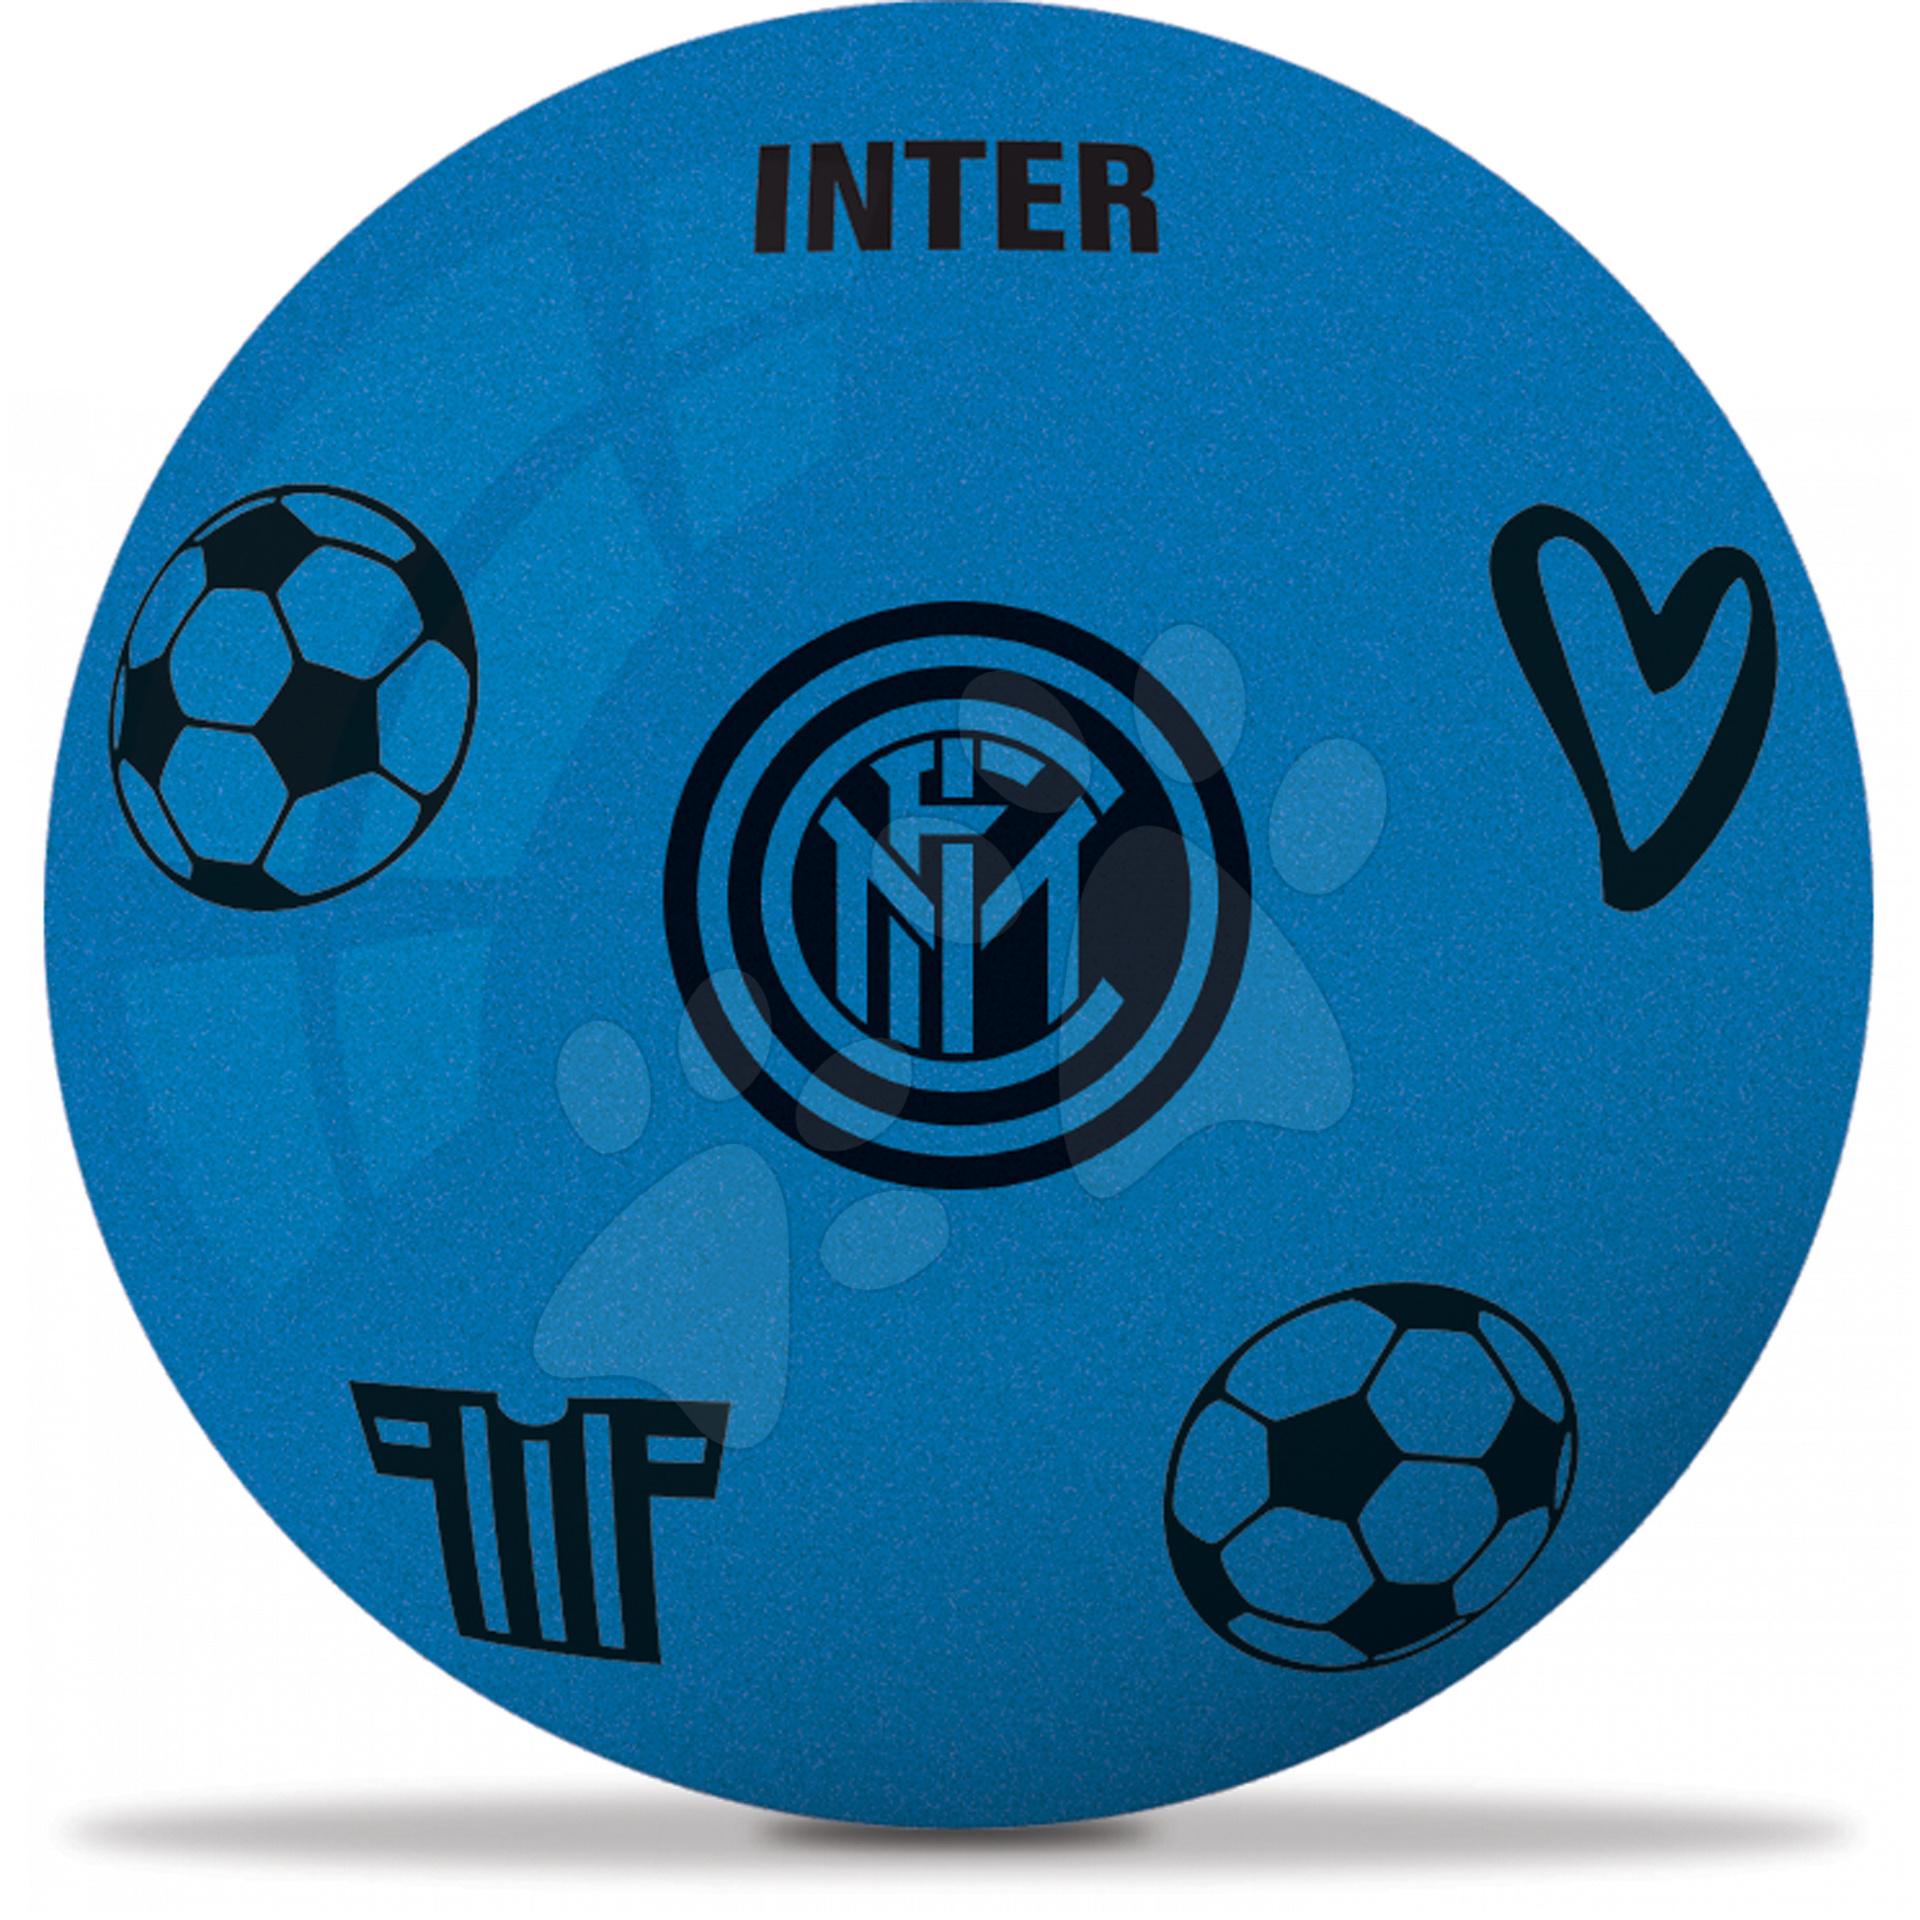 Pěnový míč F.C. Inter Mondo modrý 20 cm průměr